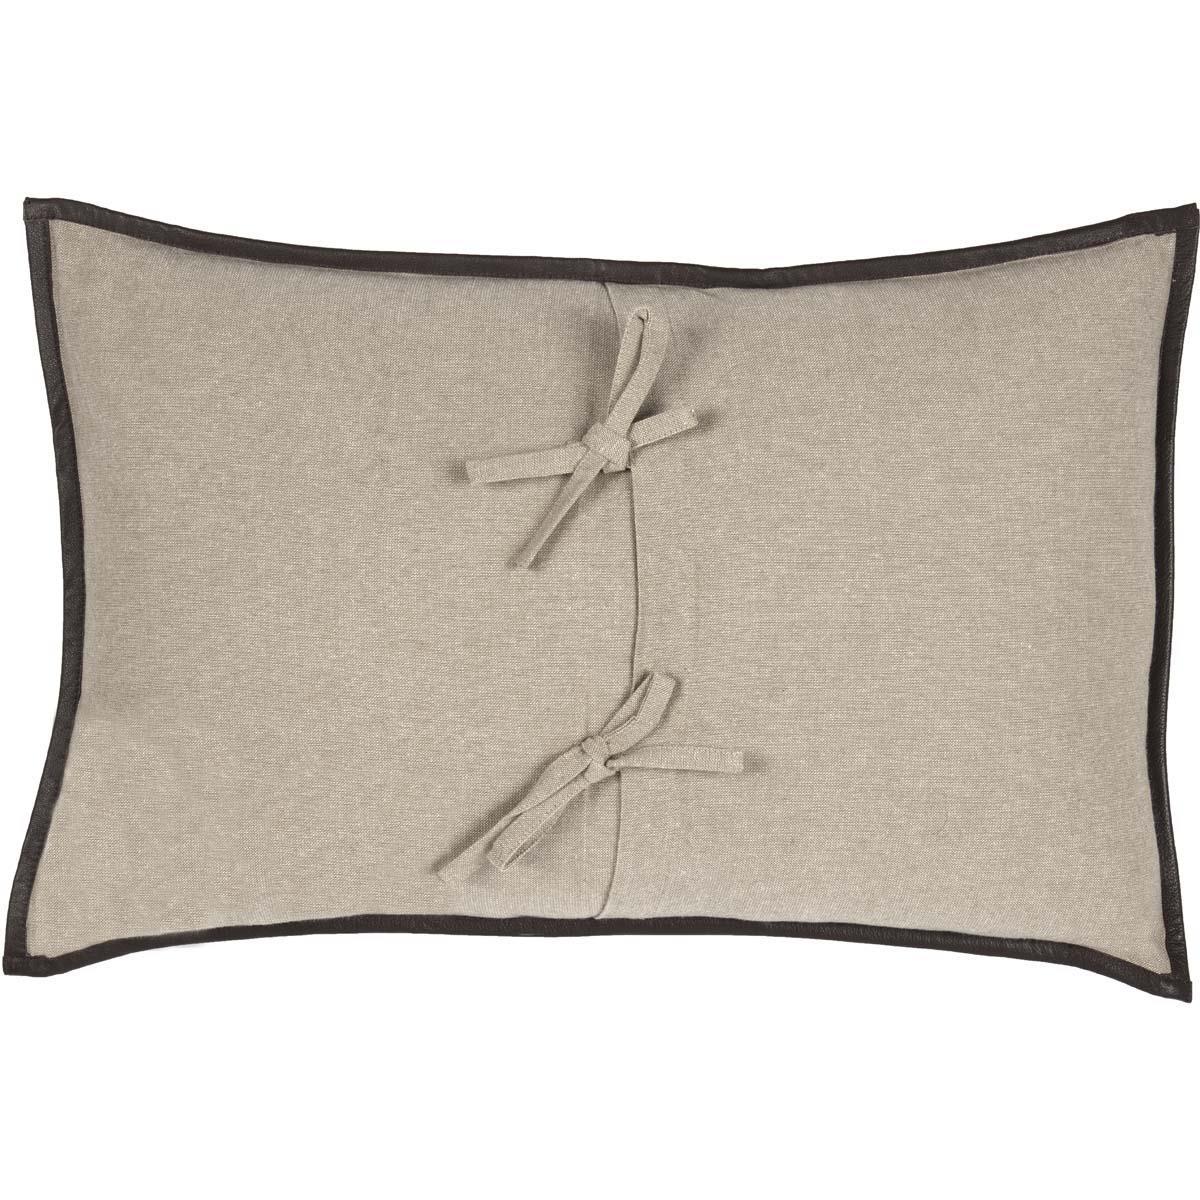 Wyatt Deer Applique Pillow - 840528162855